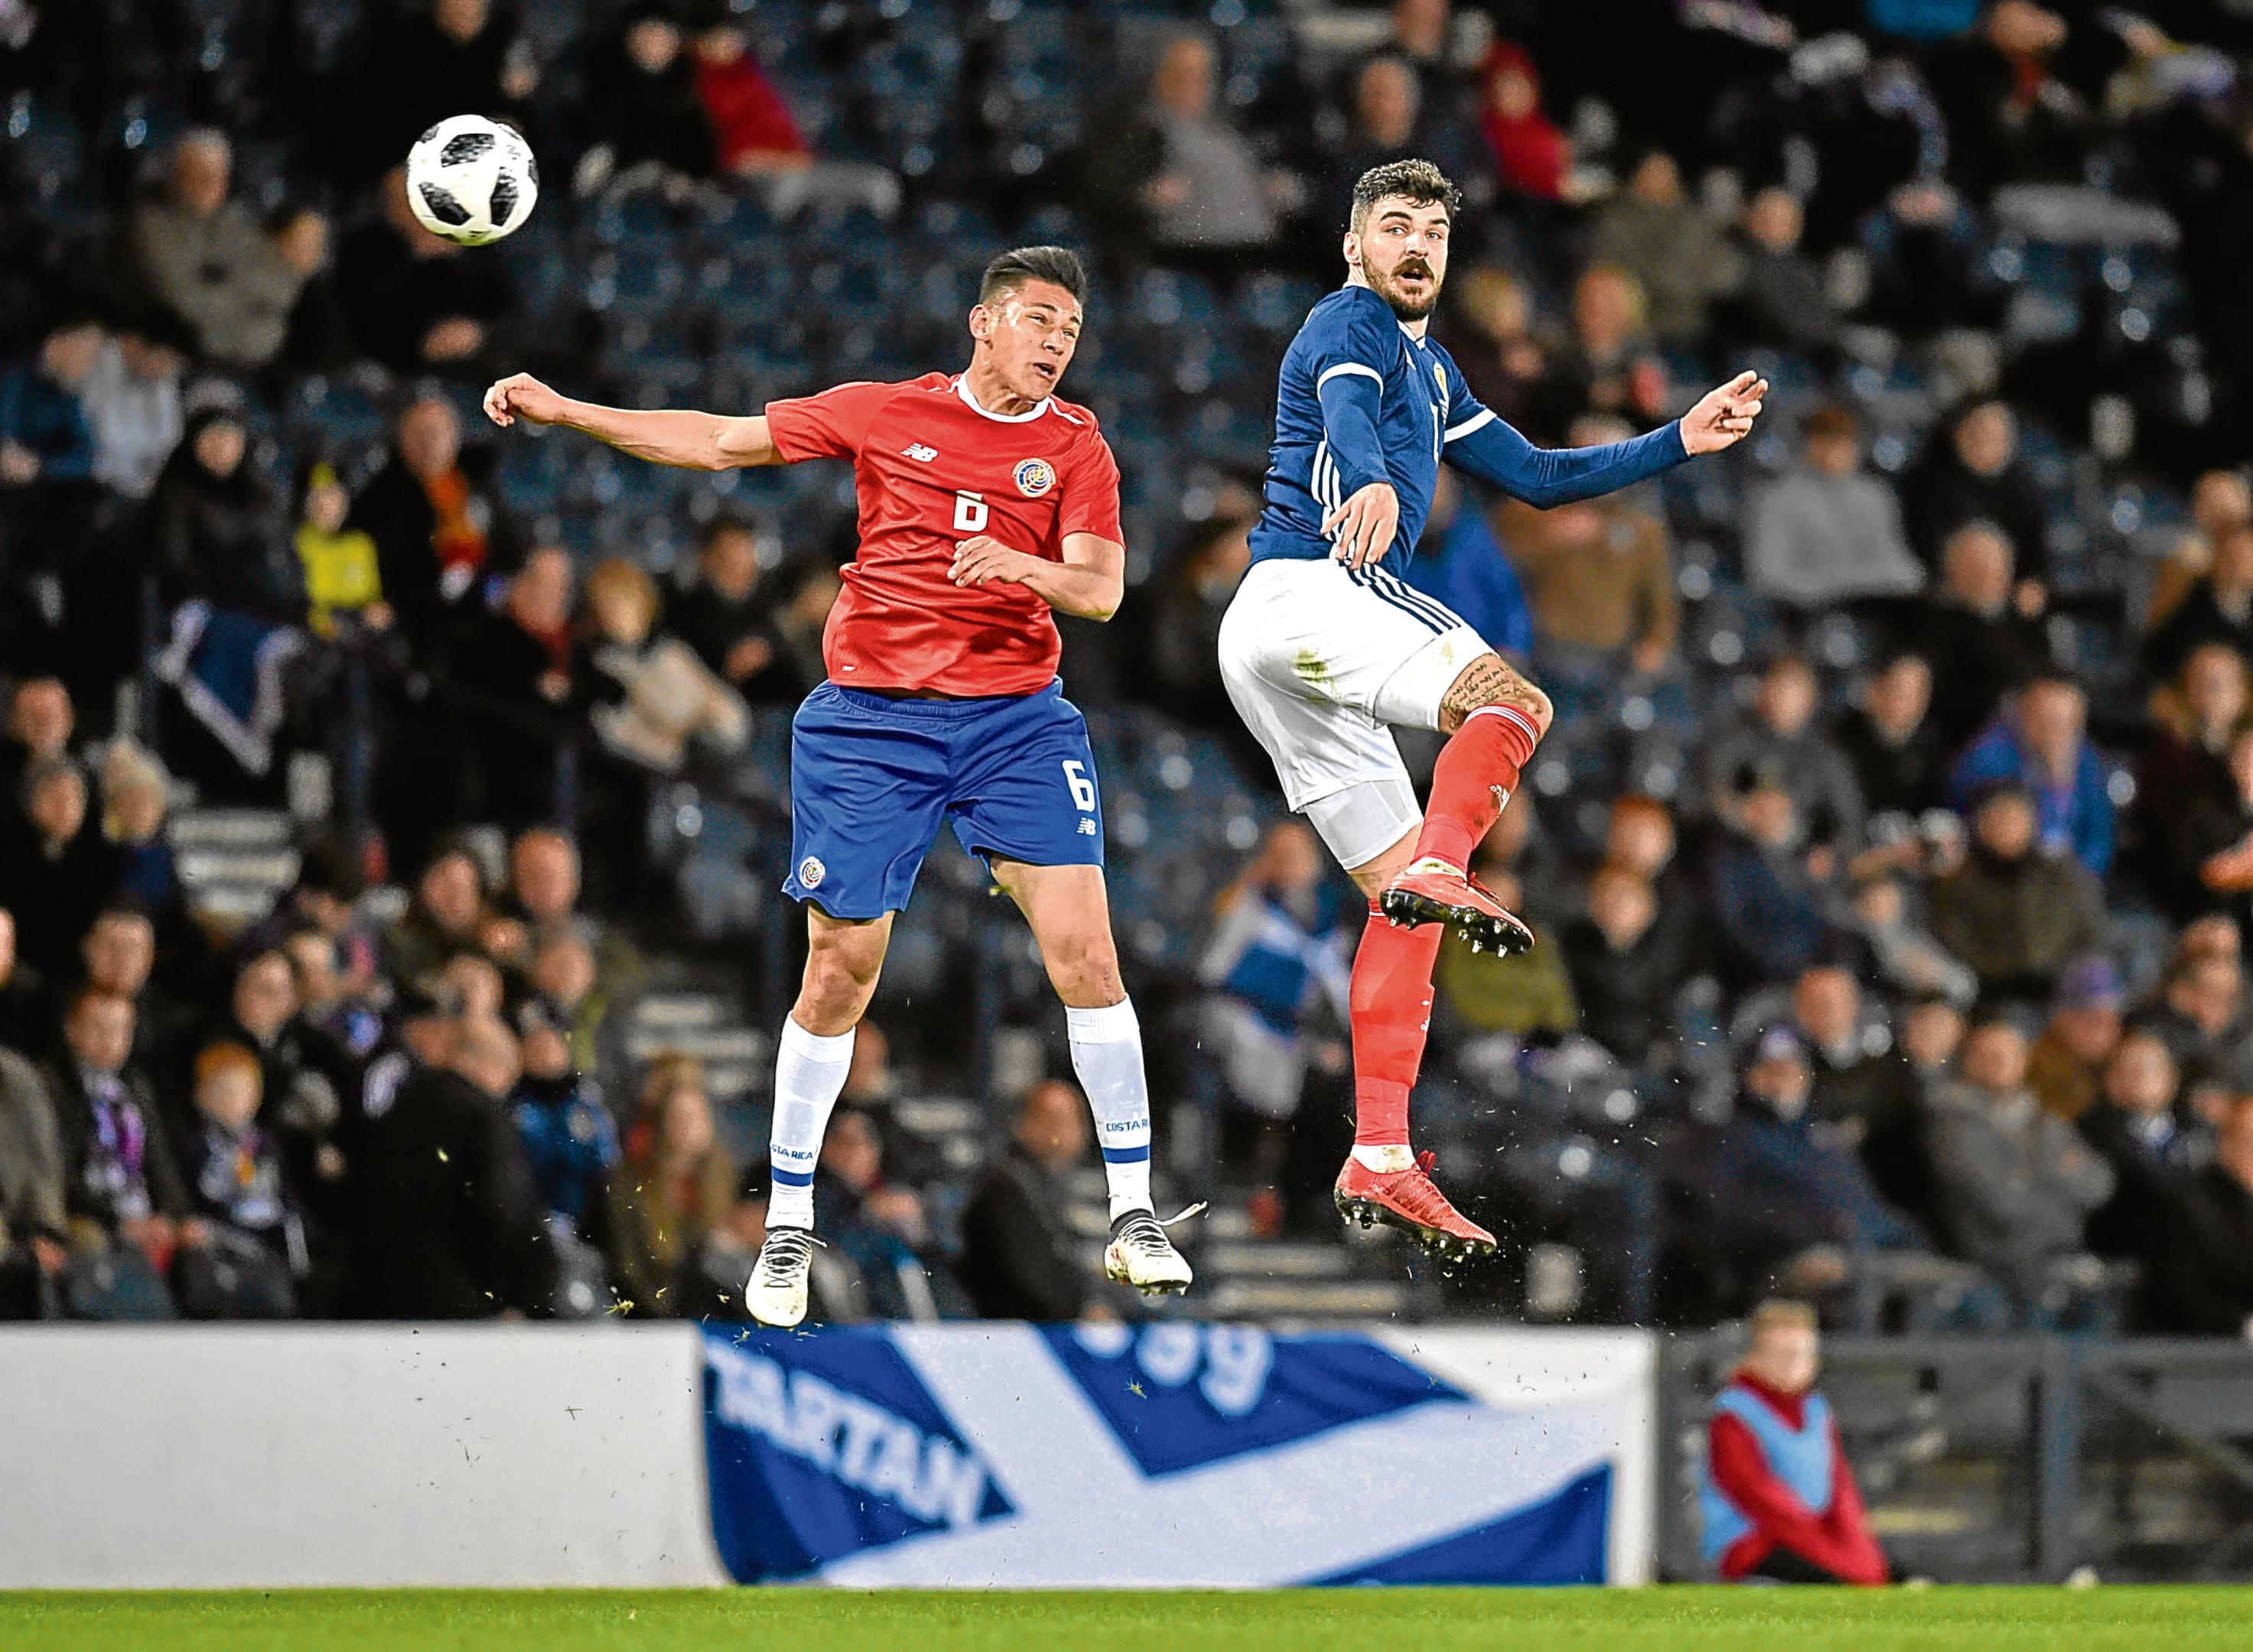 Scotland's Callum Paterson competes with Costa Rica's Oscar Duarte.